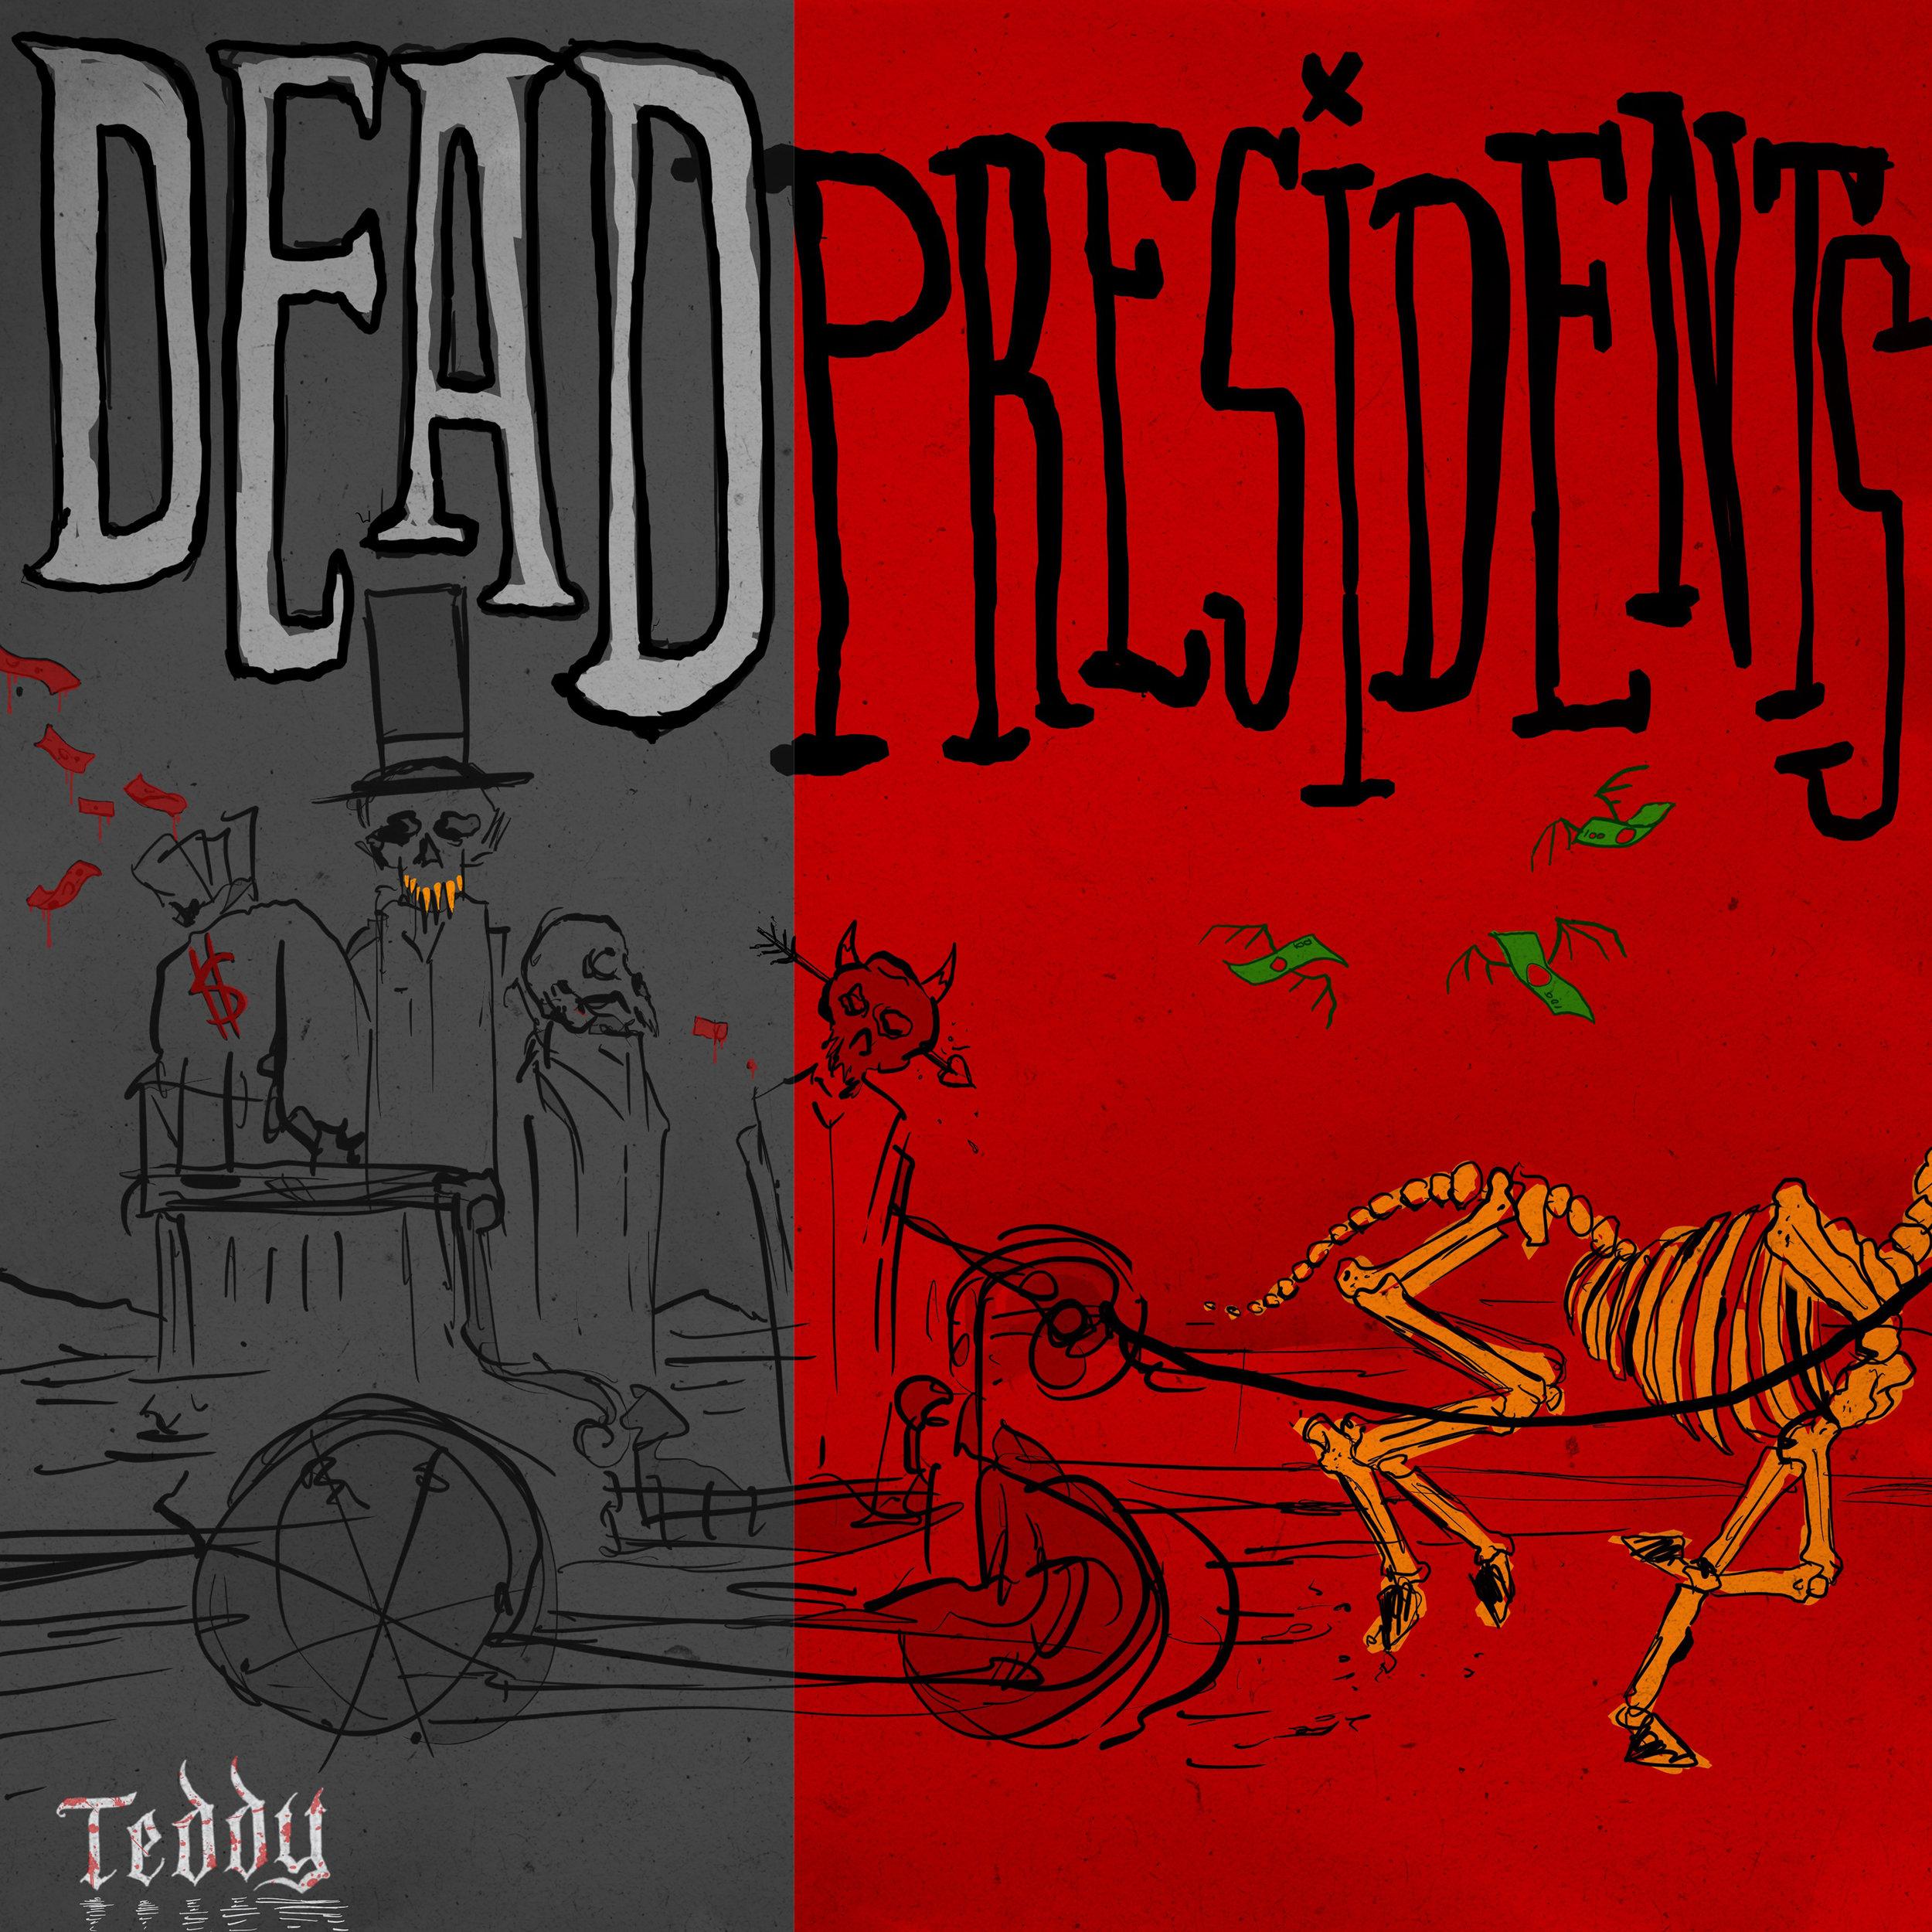 Teddy - Dead Presidents - Cover Art.jpg